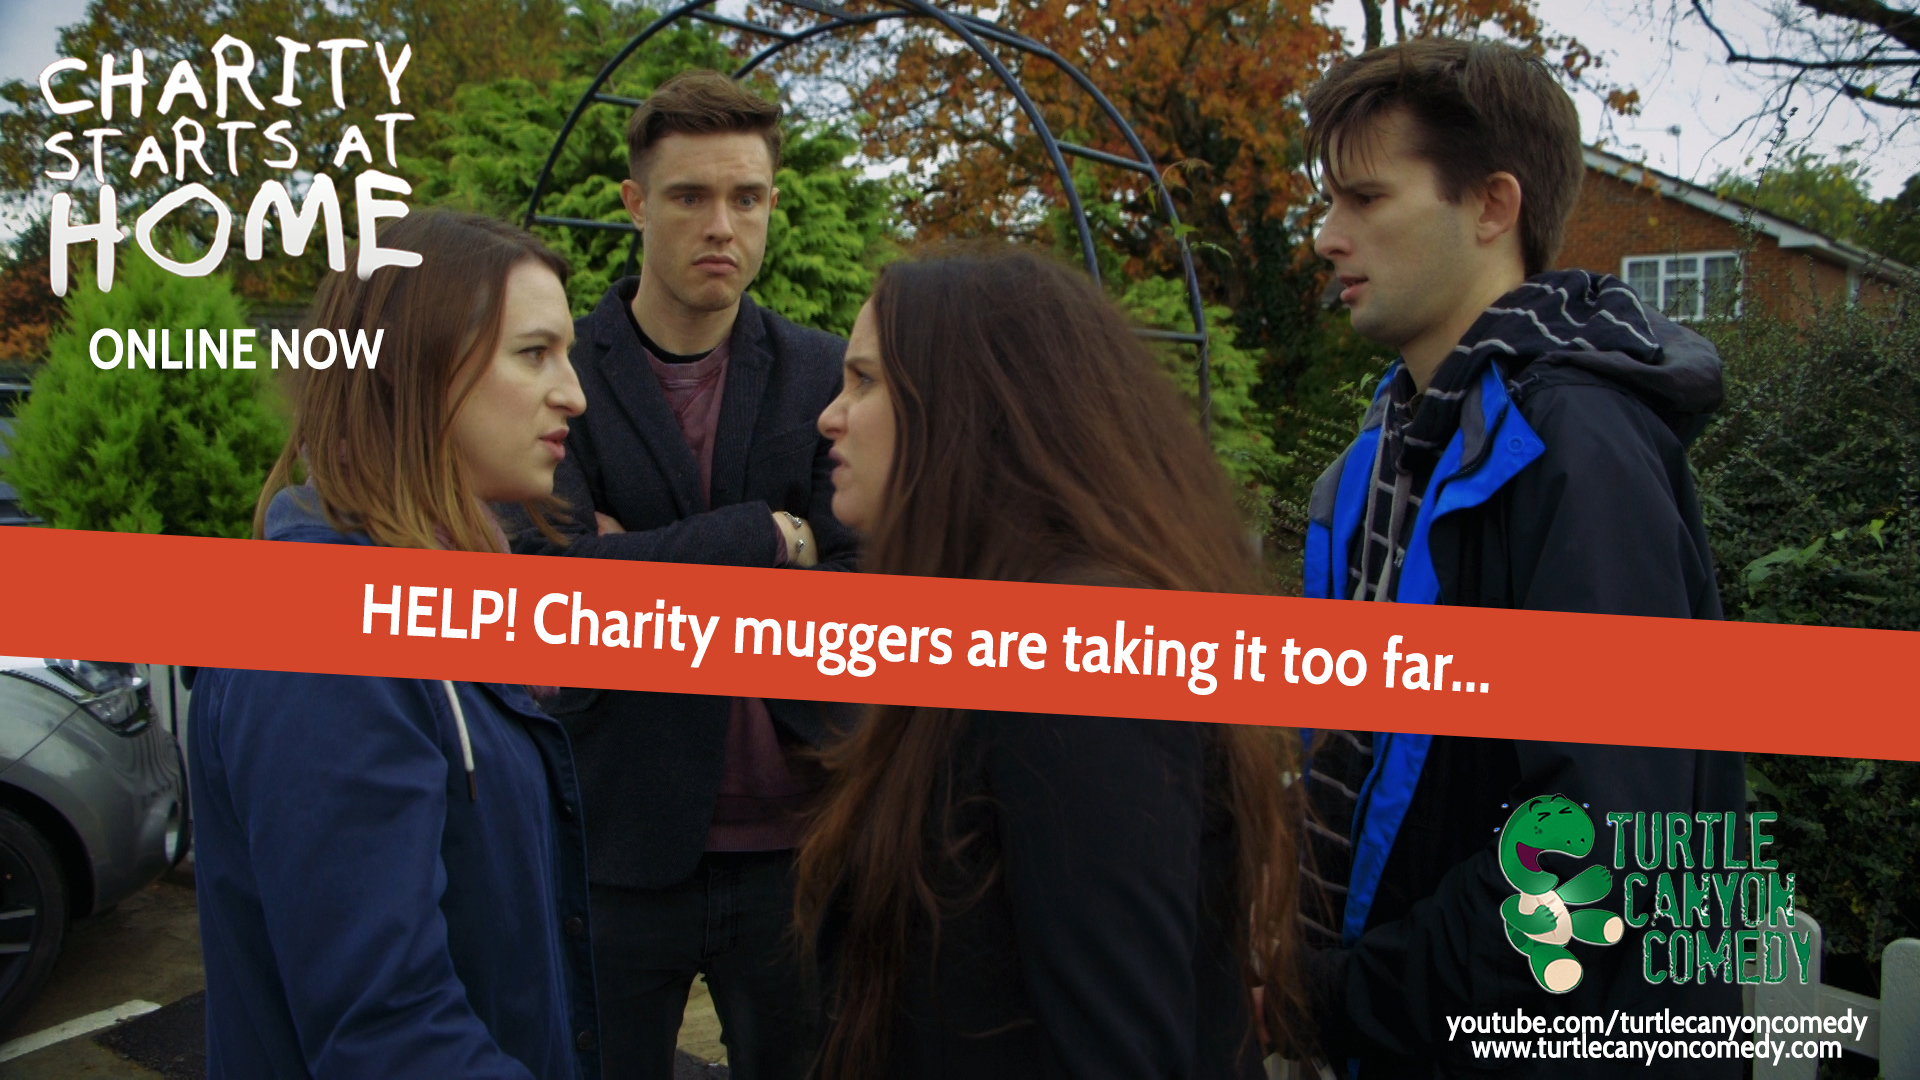 Rose Johnson, Sarah Daykin, and Kieran Hodgson in Charity Starts at Home (2015)